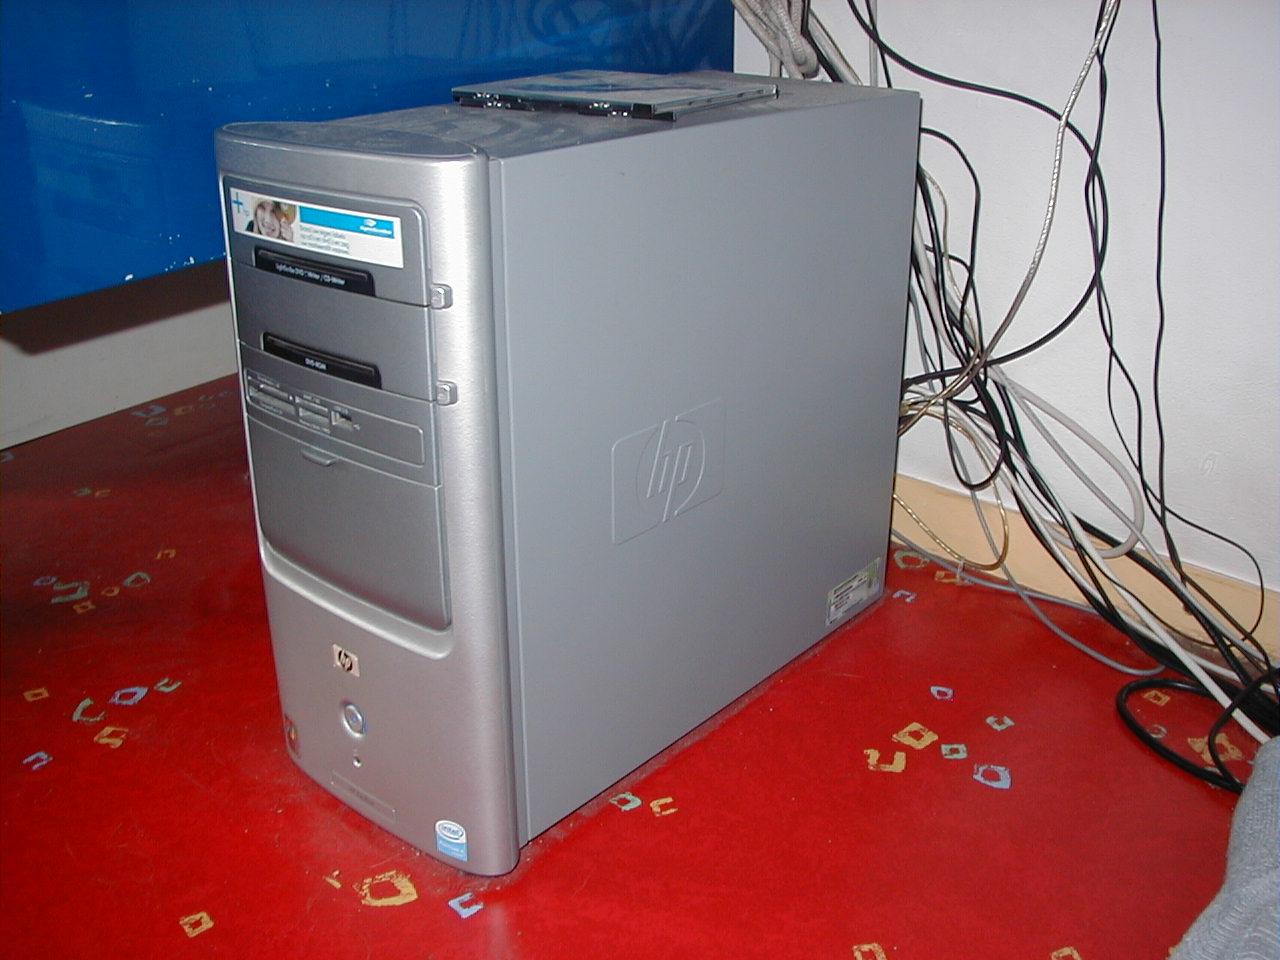 Personal Computer (HP Pavilion t3360.nl)